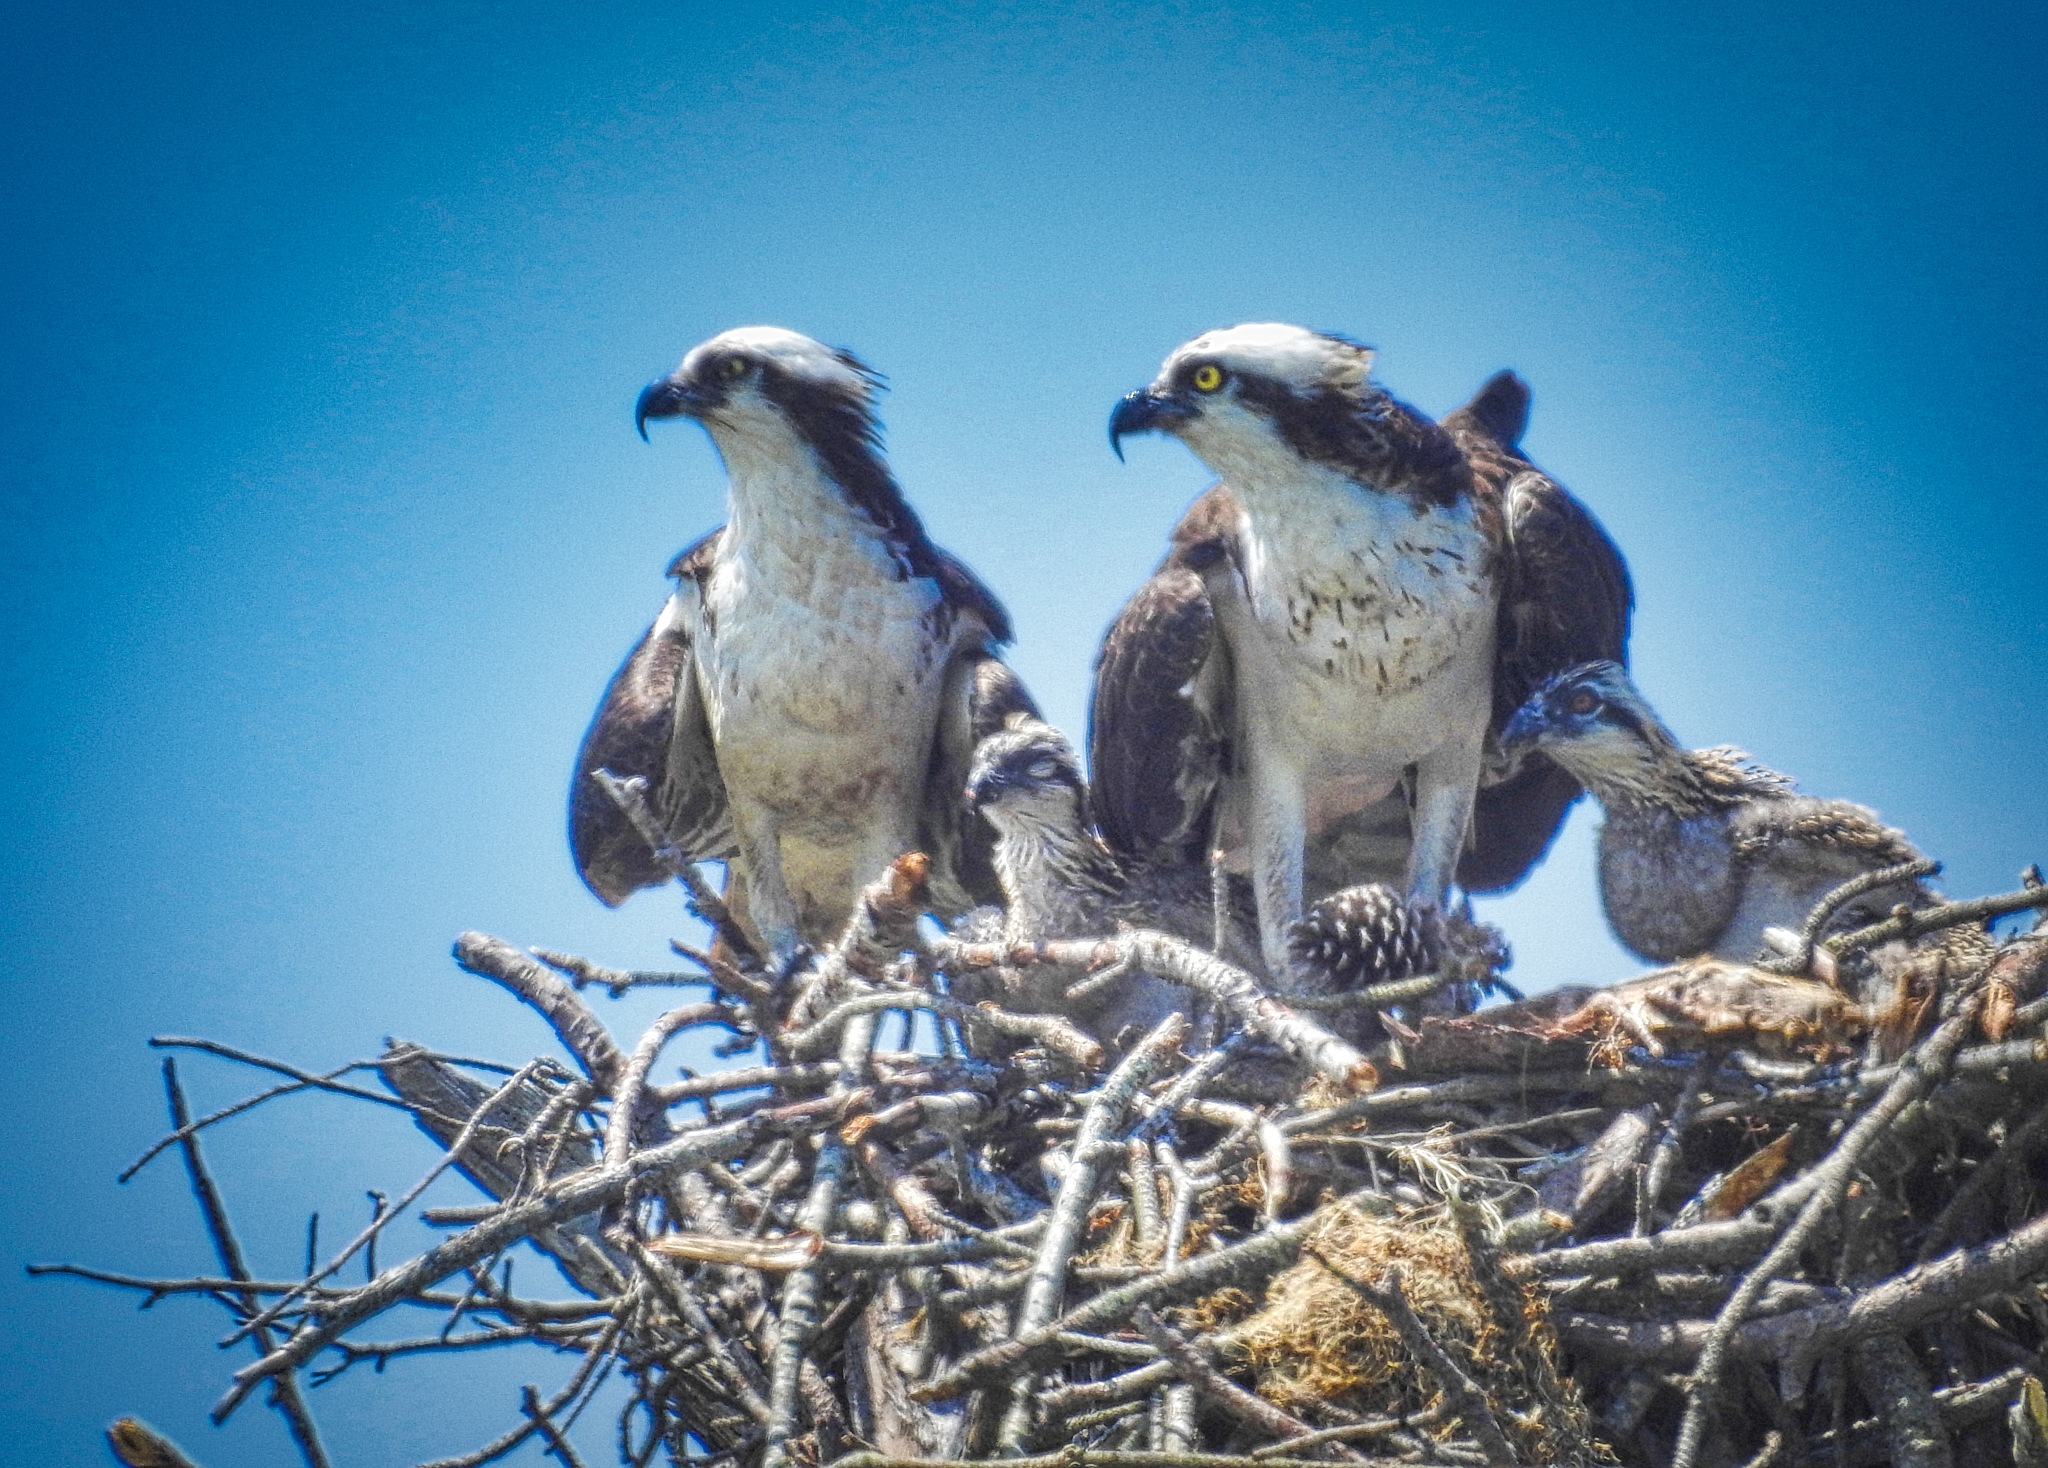 Osprey Family by Daria